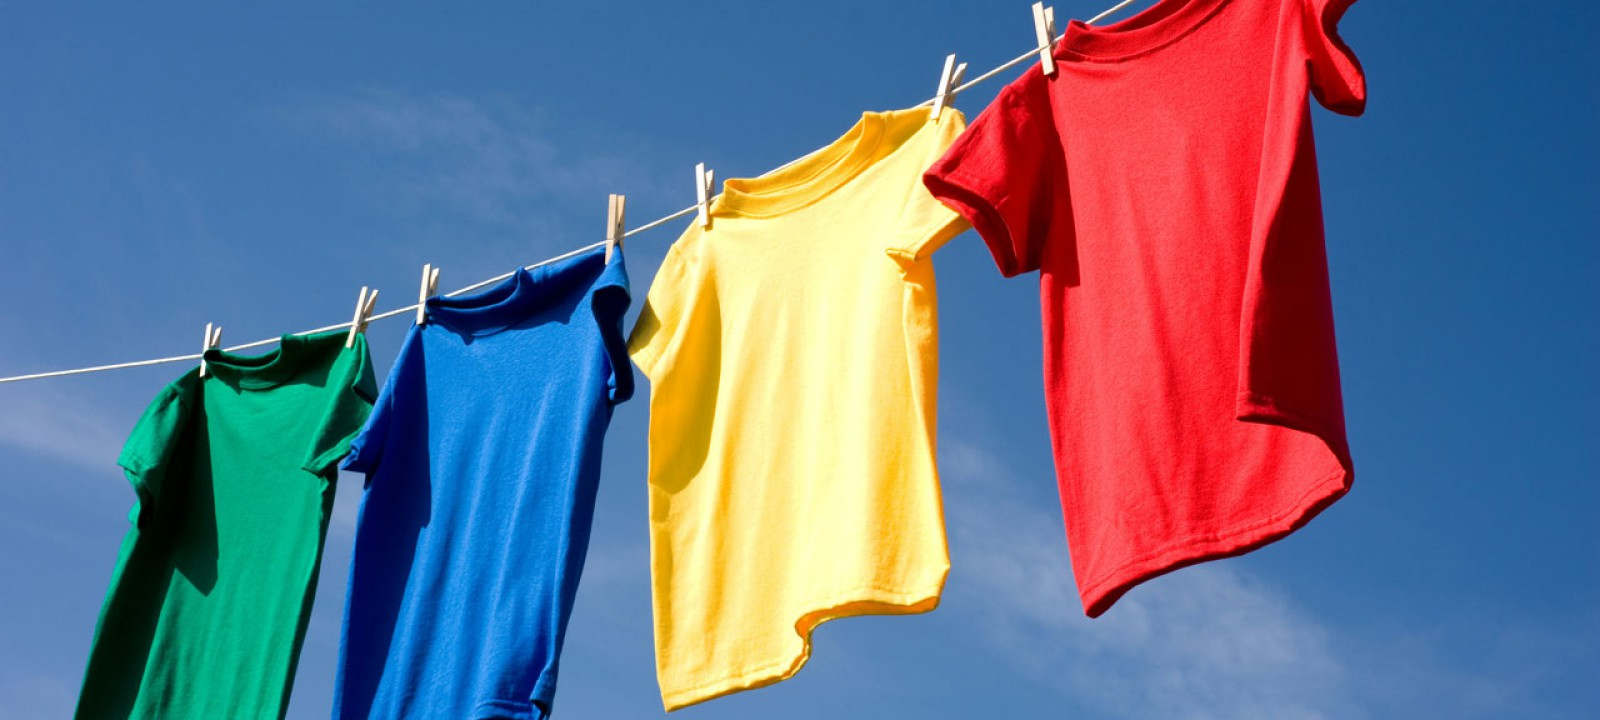 1280x720_clothesline